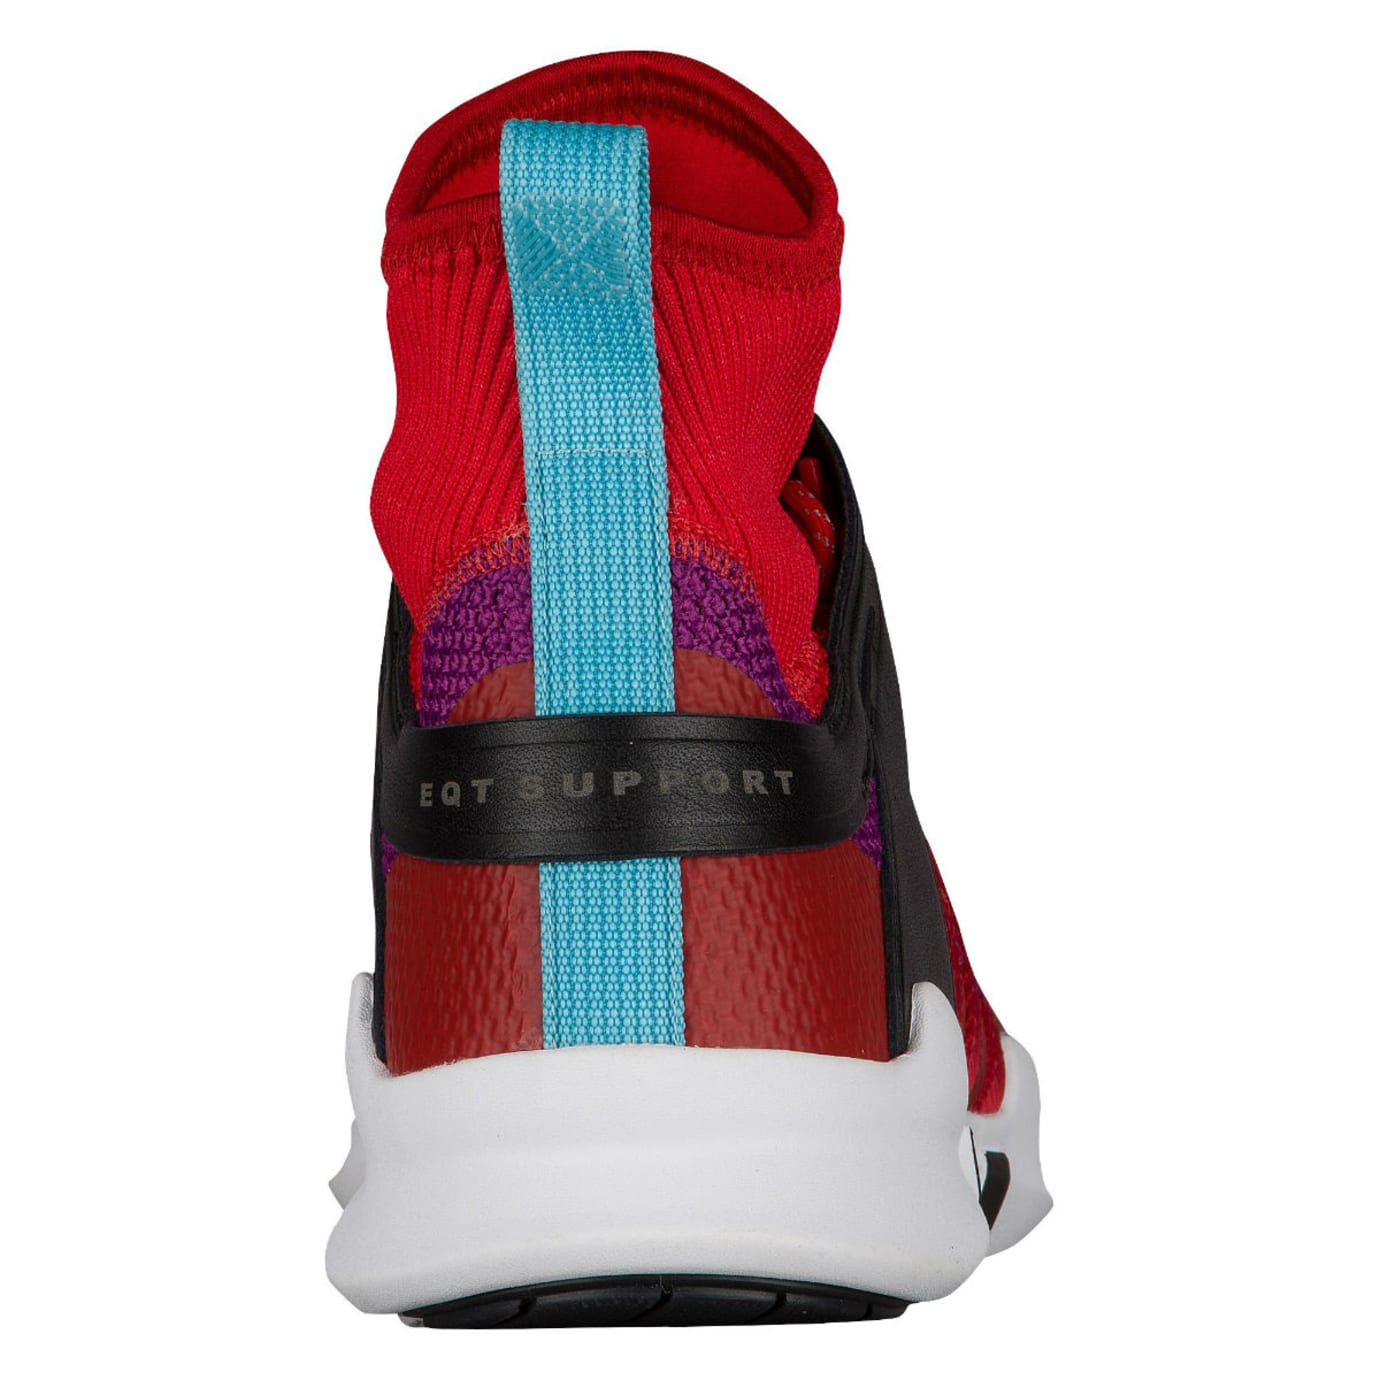 detailed look dd800 16da6 Adidas EQT Support ADV Winter Scarlet Shock Purple Release Date Heel